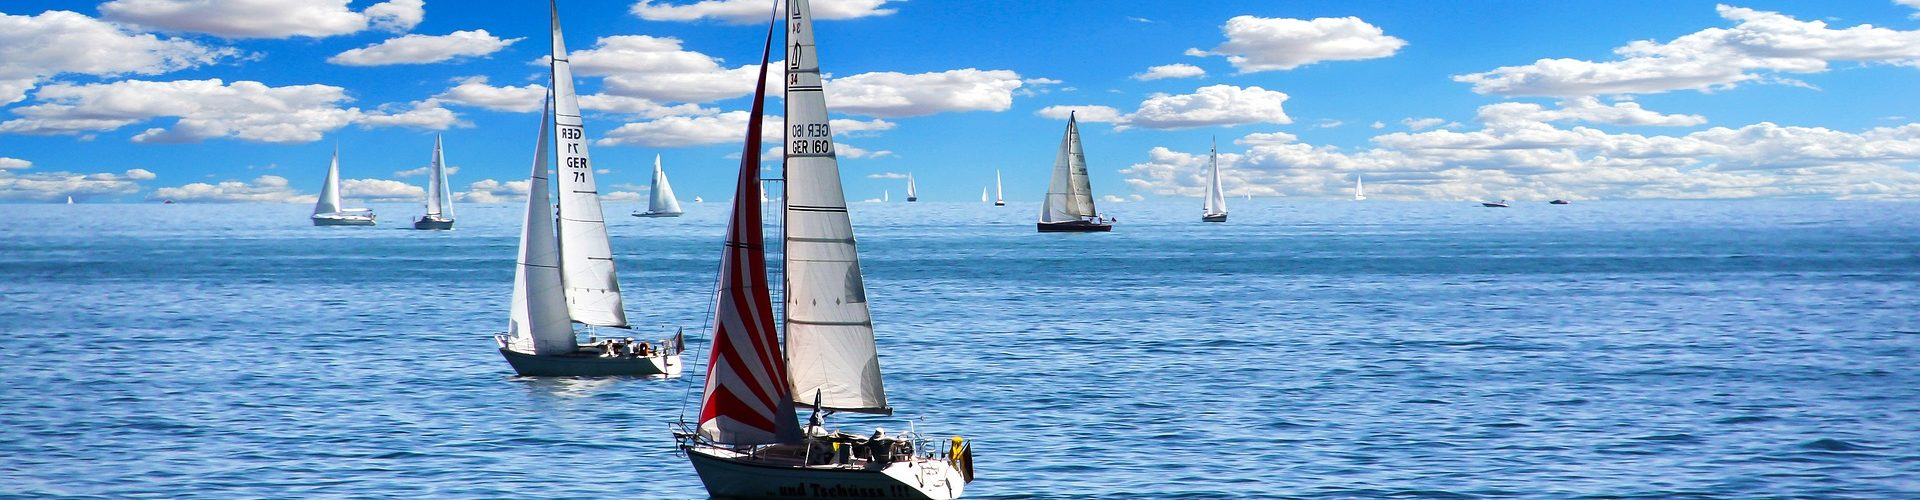 segeln lernen in Dillingen an der Donau segelschein machen in Dillingen an der Donau 1920x500 - Segeln lernen in Dillingen an der Donau